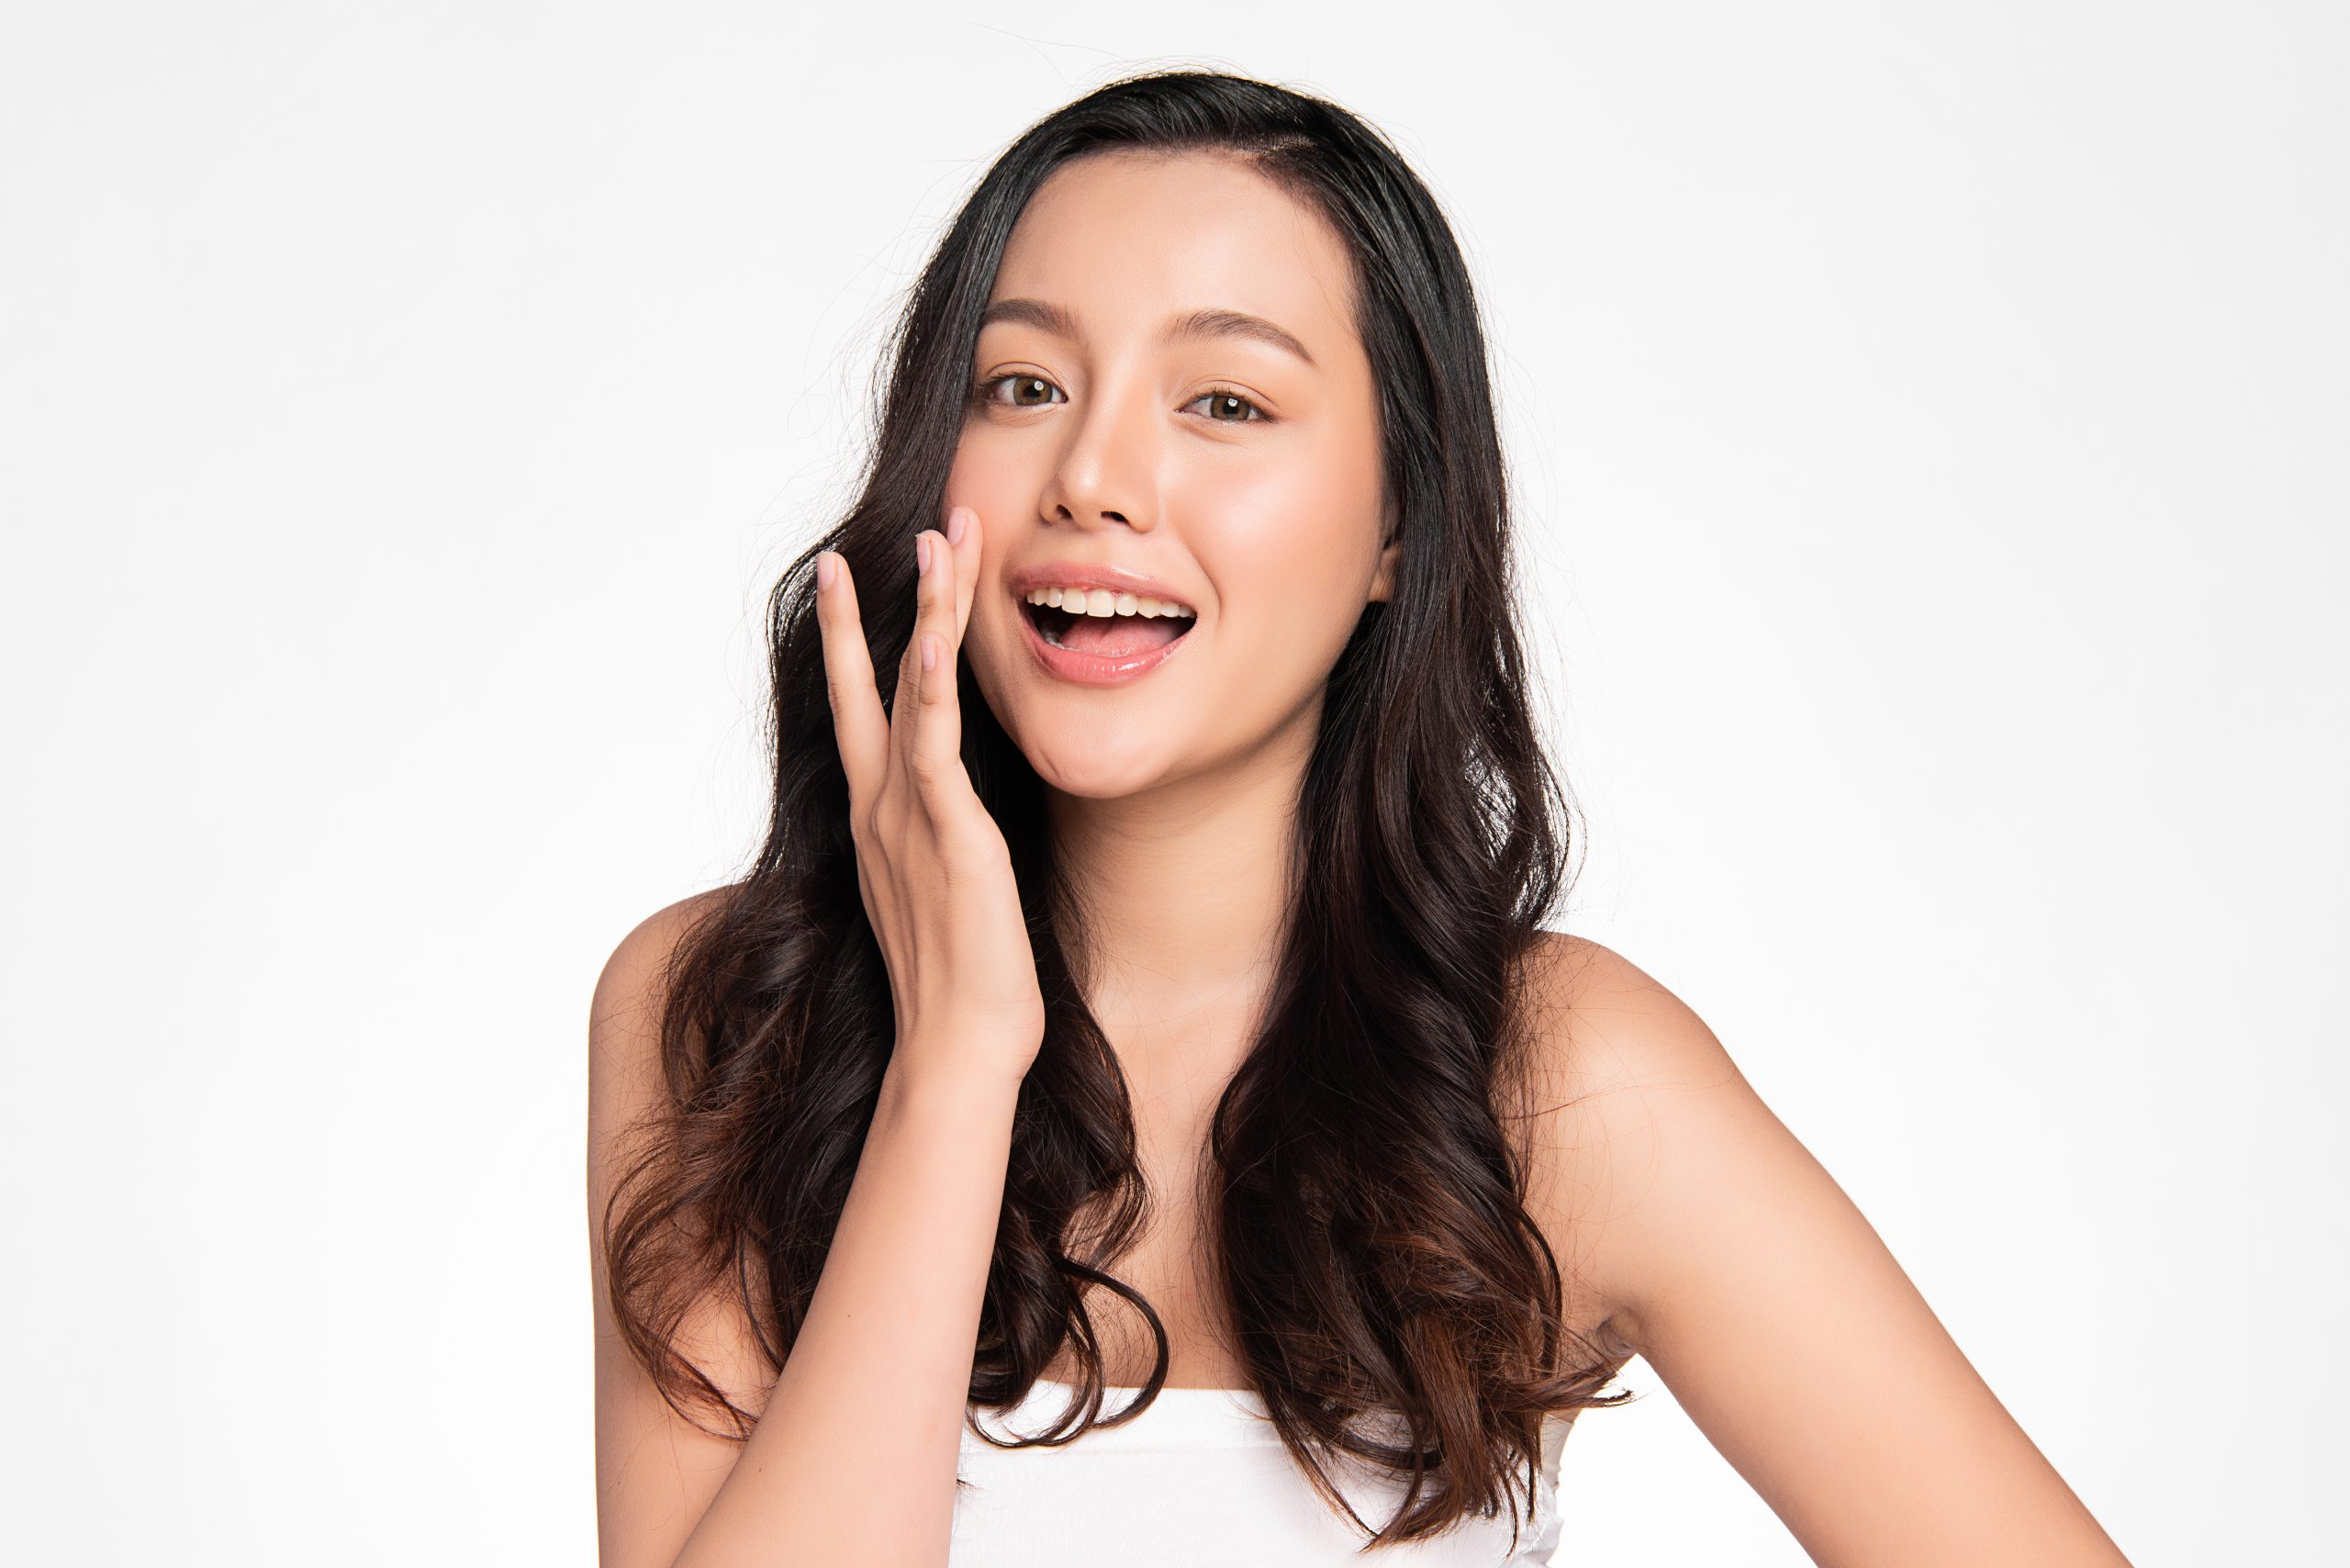 Sara-Outcall massage Las Vegas-Asian Massage Therapists - 24 Hour Las Vegas Massage